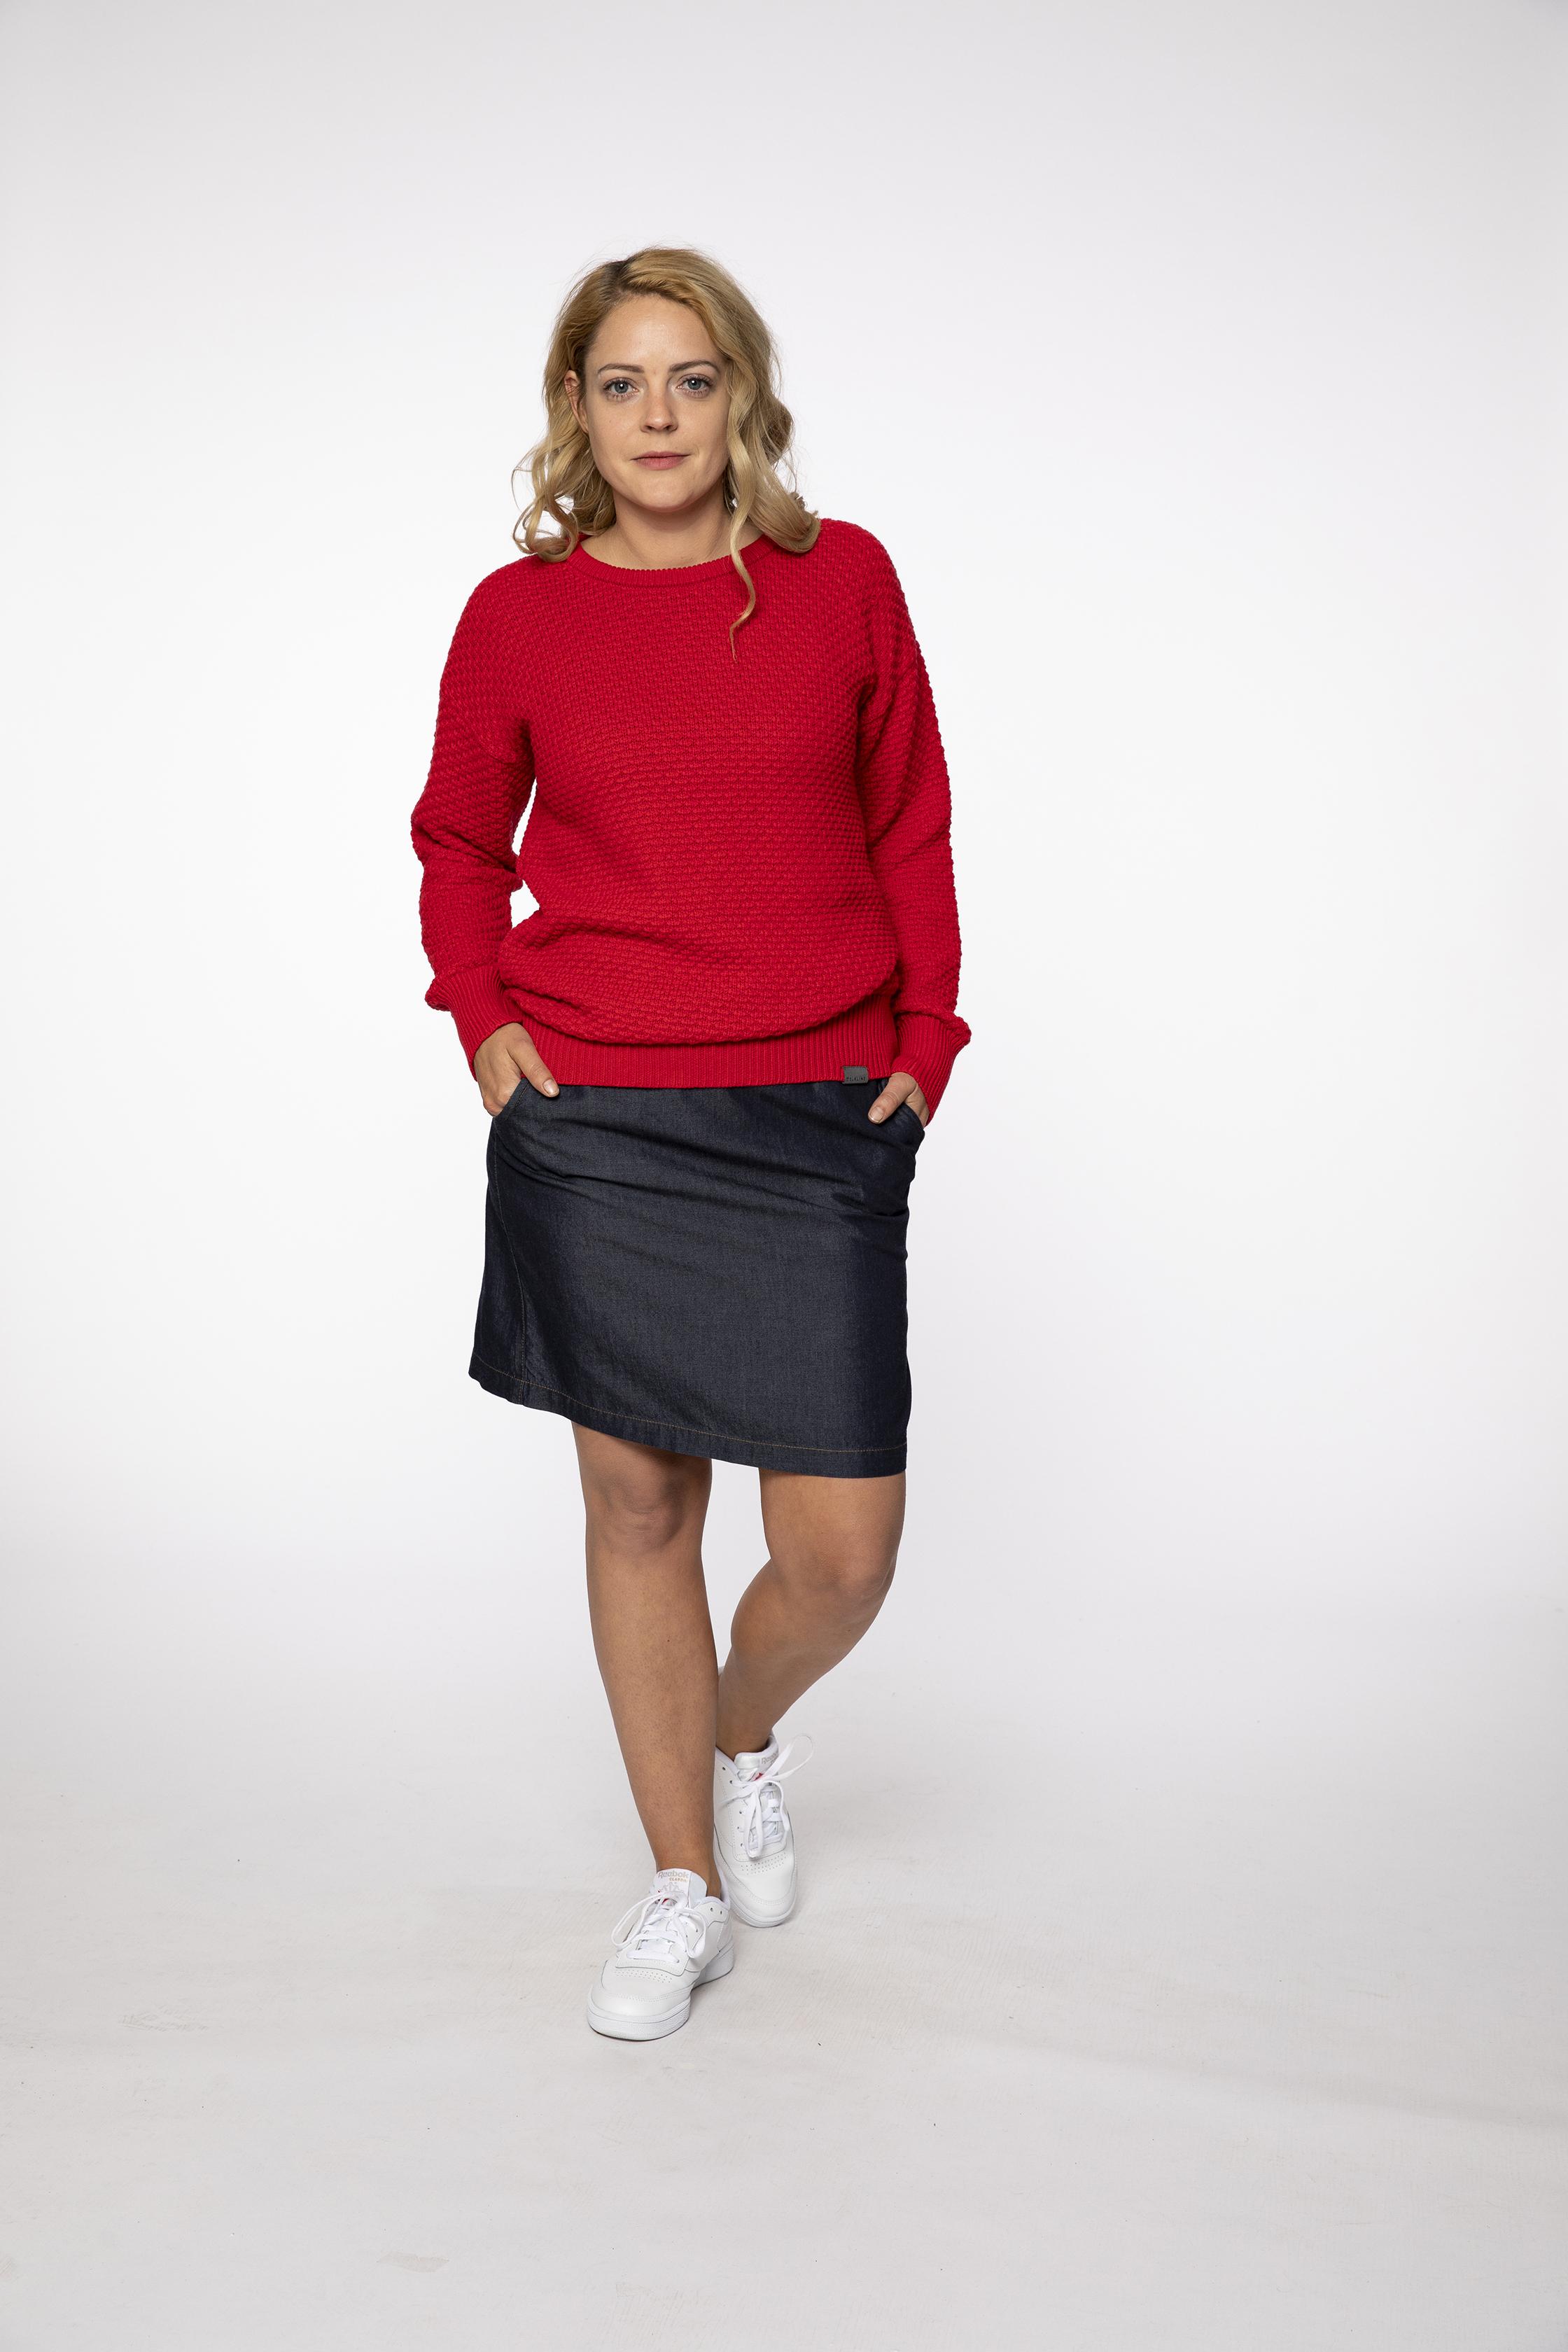 knit pullover:  PASSINGBY   skirt:  HAPPYGOLUCKY